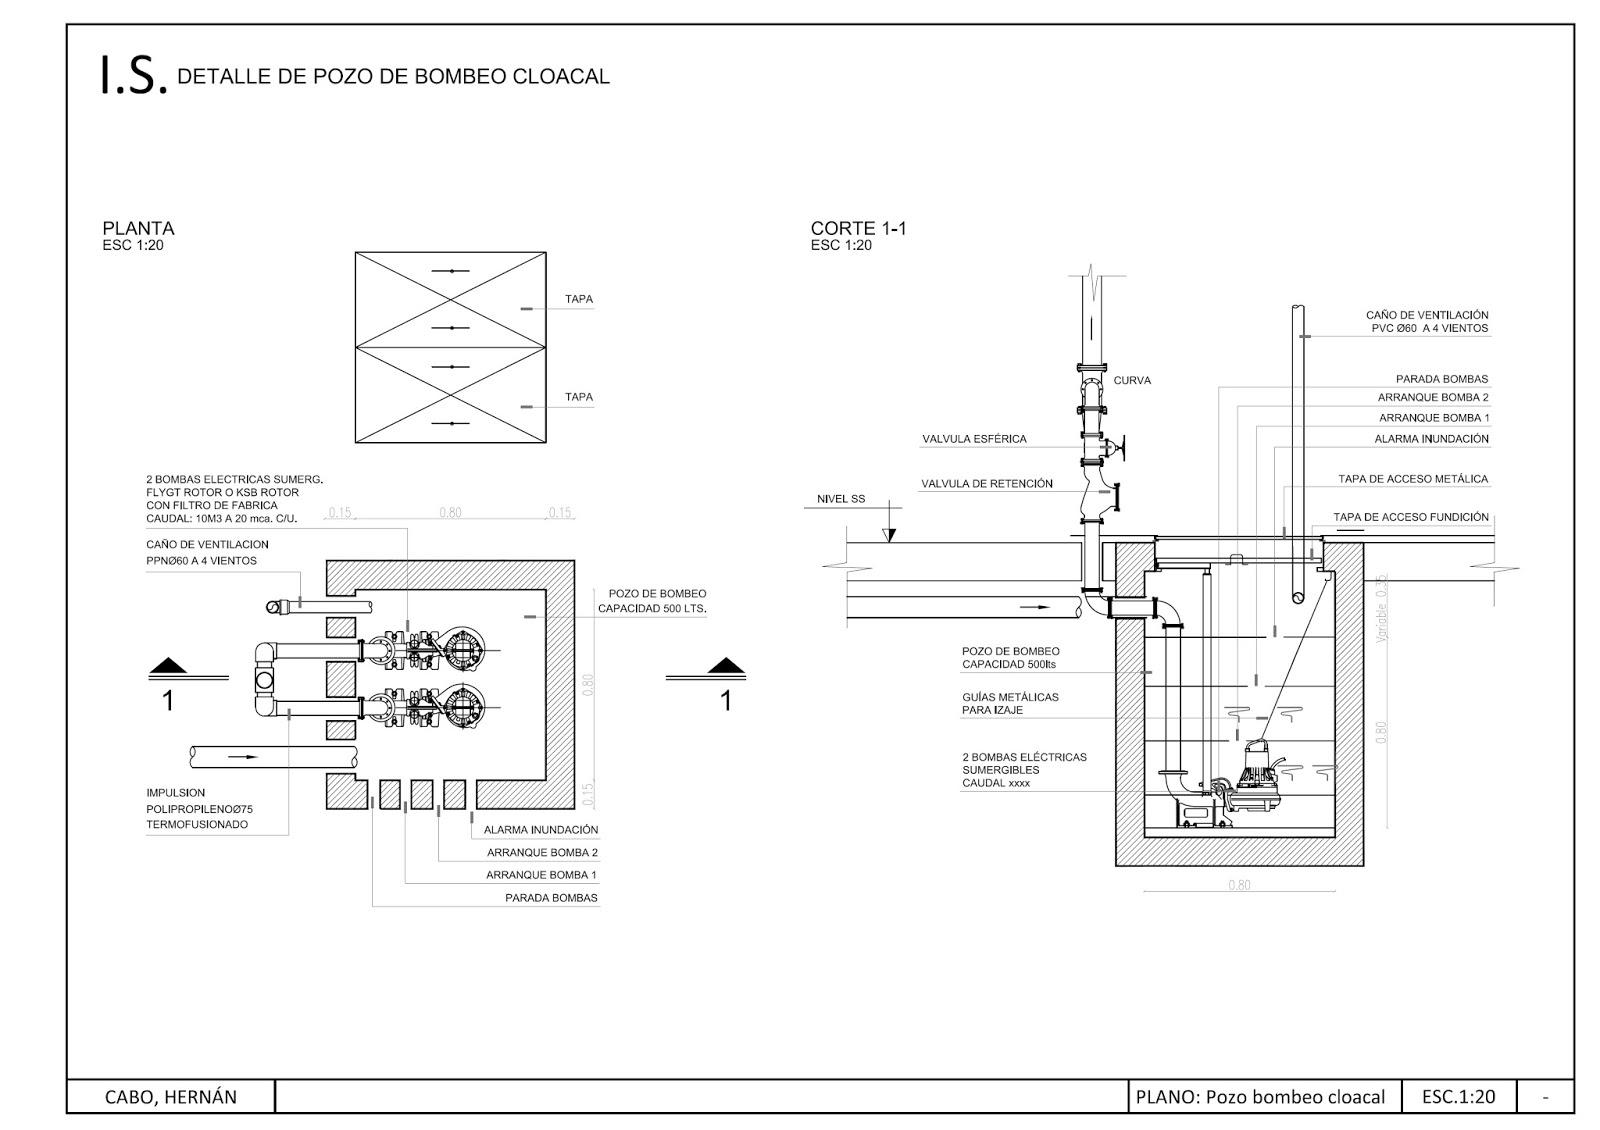 Detalles constructivos cad detalle constructivo pozo de - Bombas de superficie para pozos ...